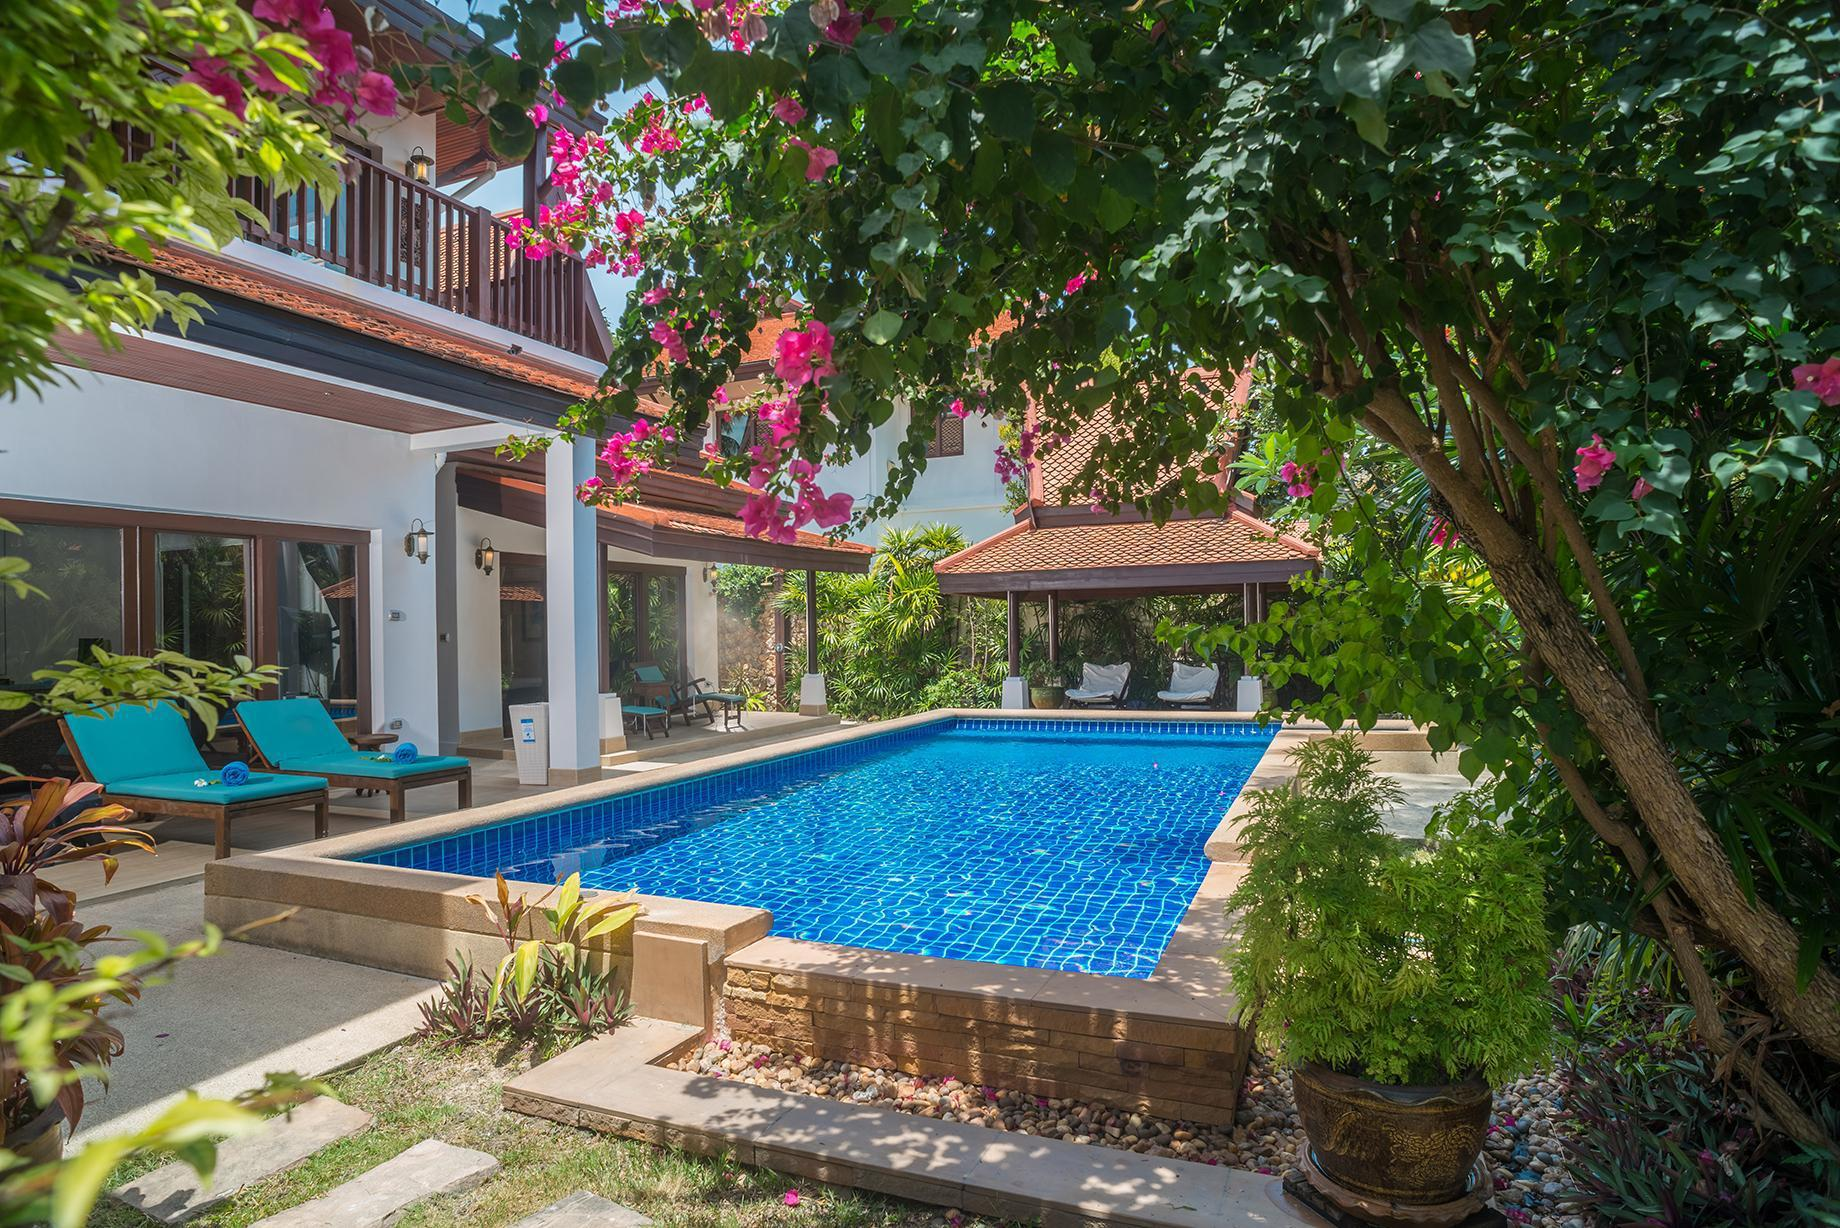 Beachfront Resort Villa Baan Frangipani 4BR 4 ห้องนอน 4 ห้องน้ำส่วนตัว ขนาด 337 ตร.ม. – หัวถนน